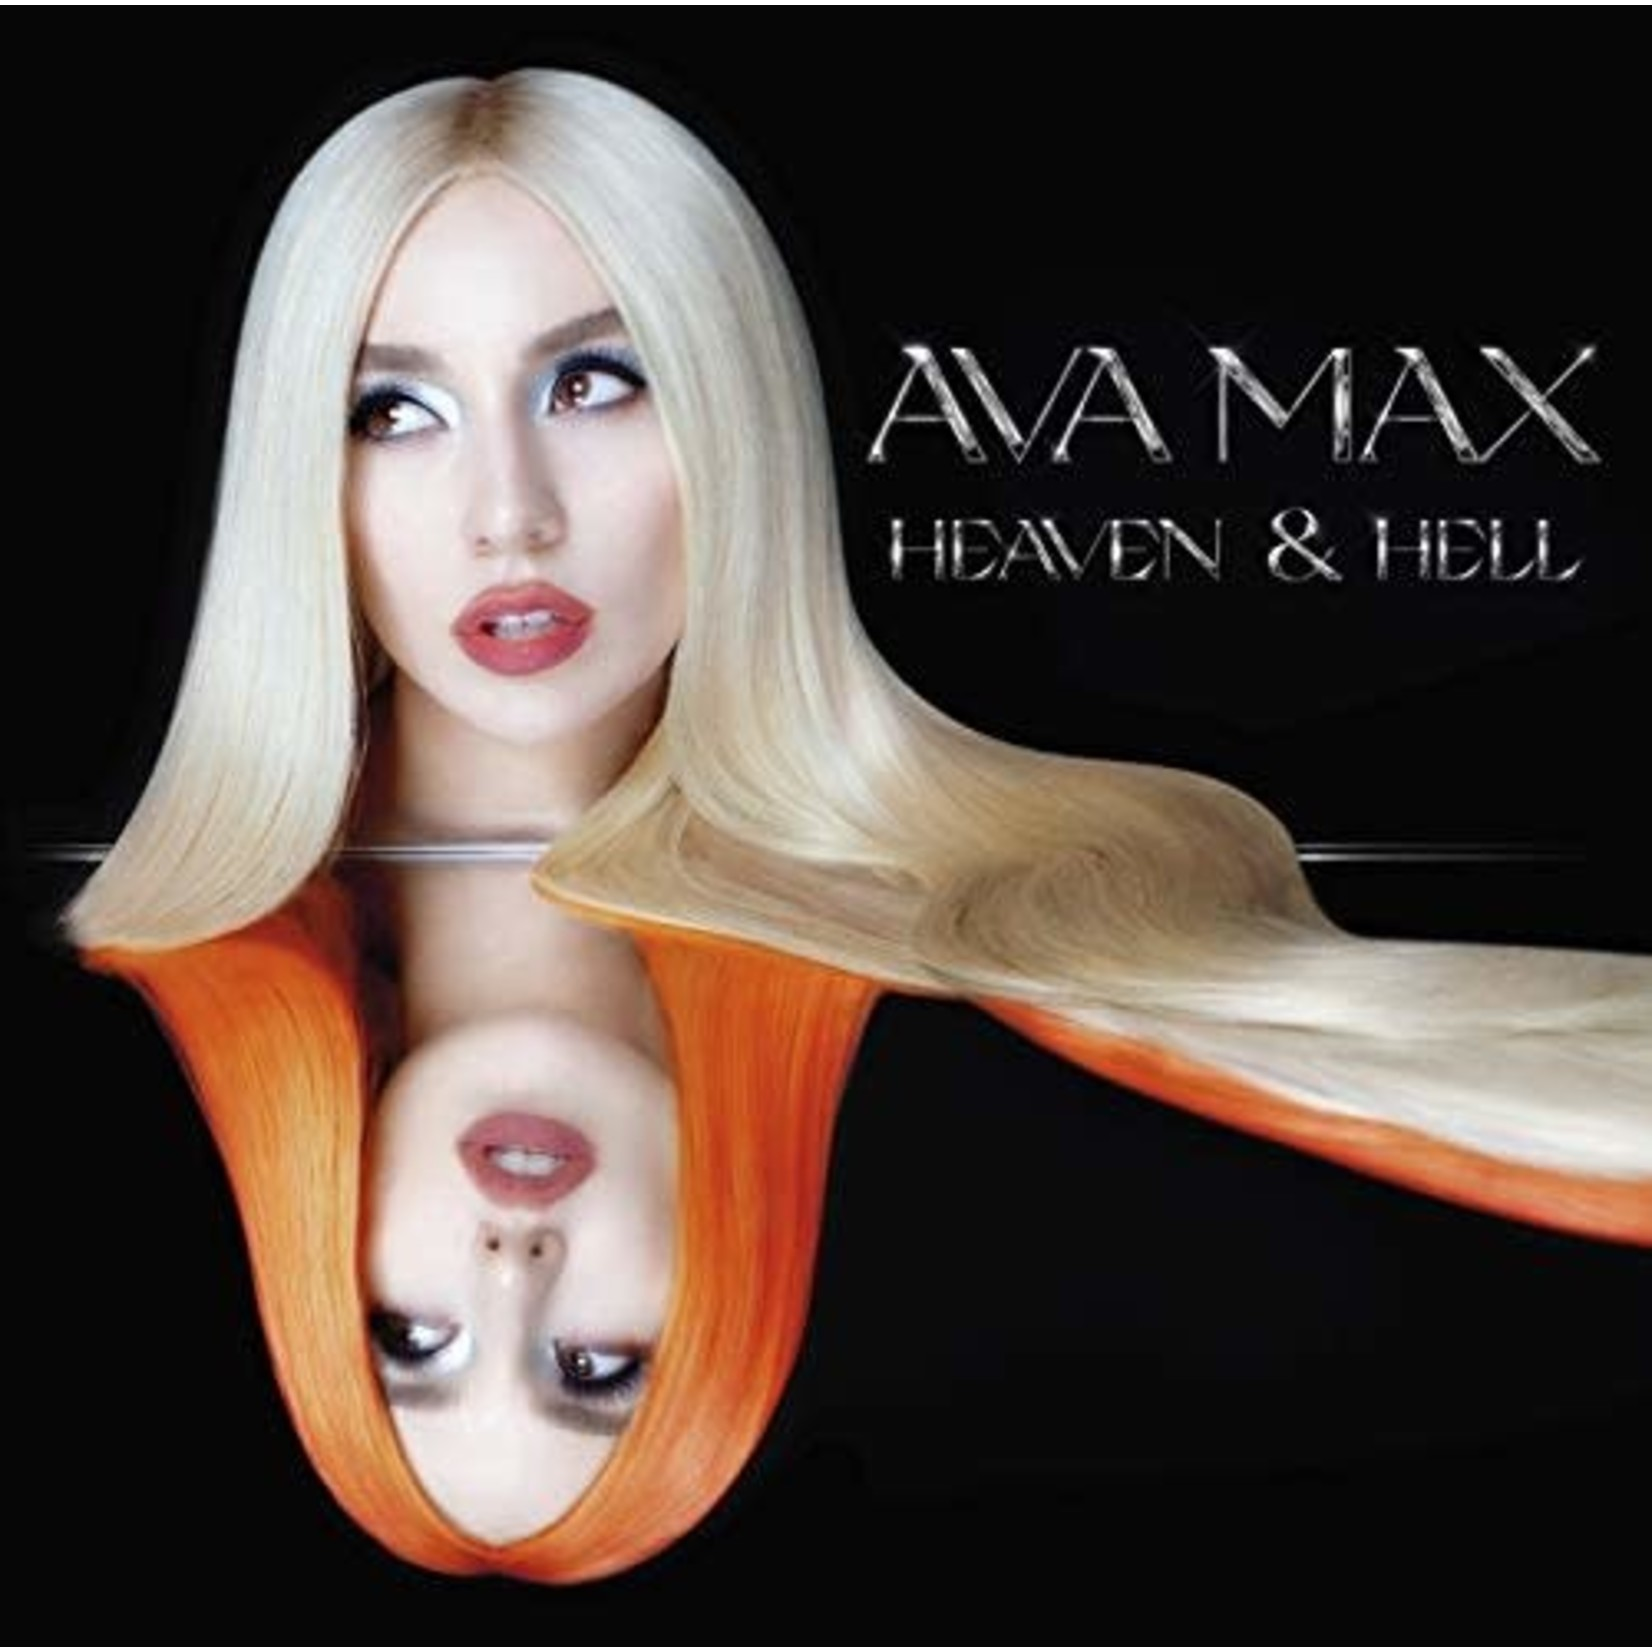 [New] Max, Ava: Heaven & Hell (curacao transparent vinyl)